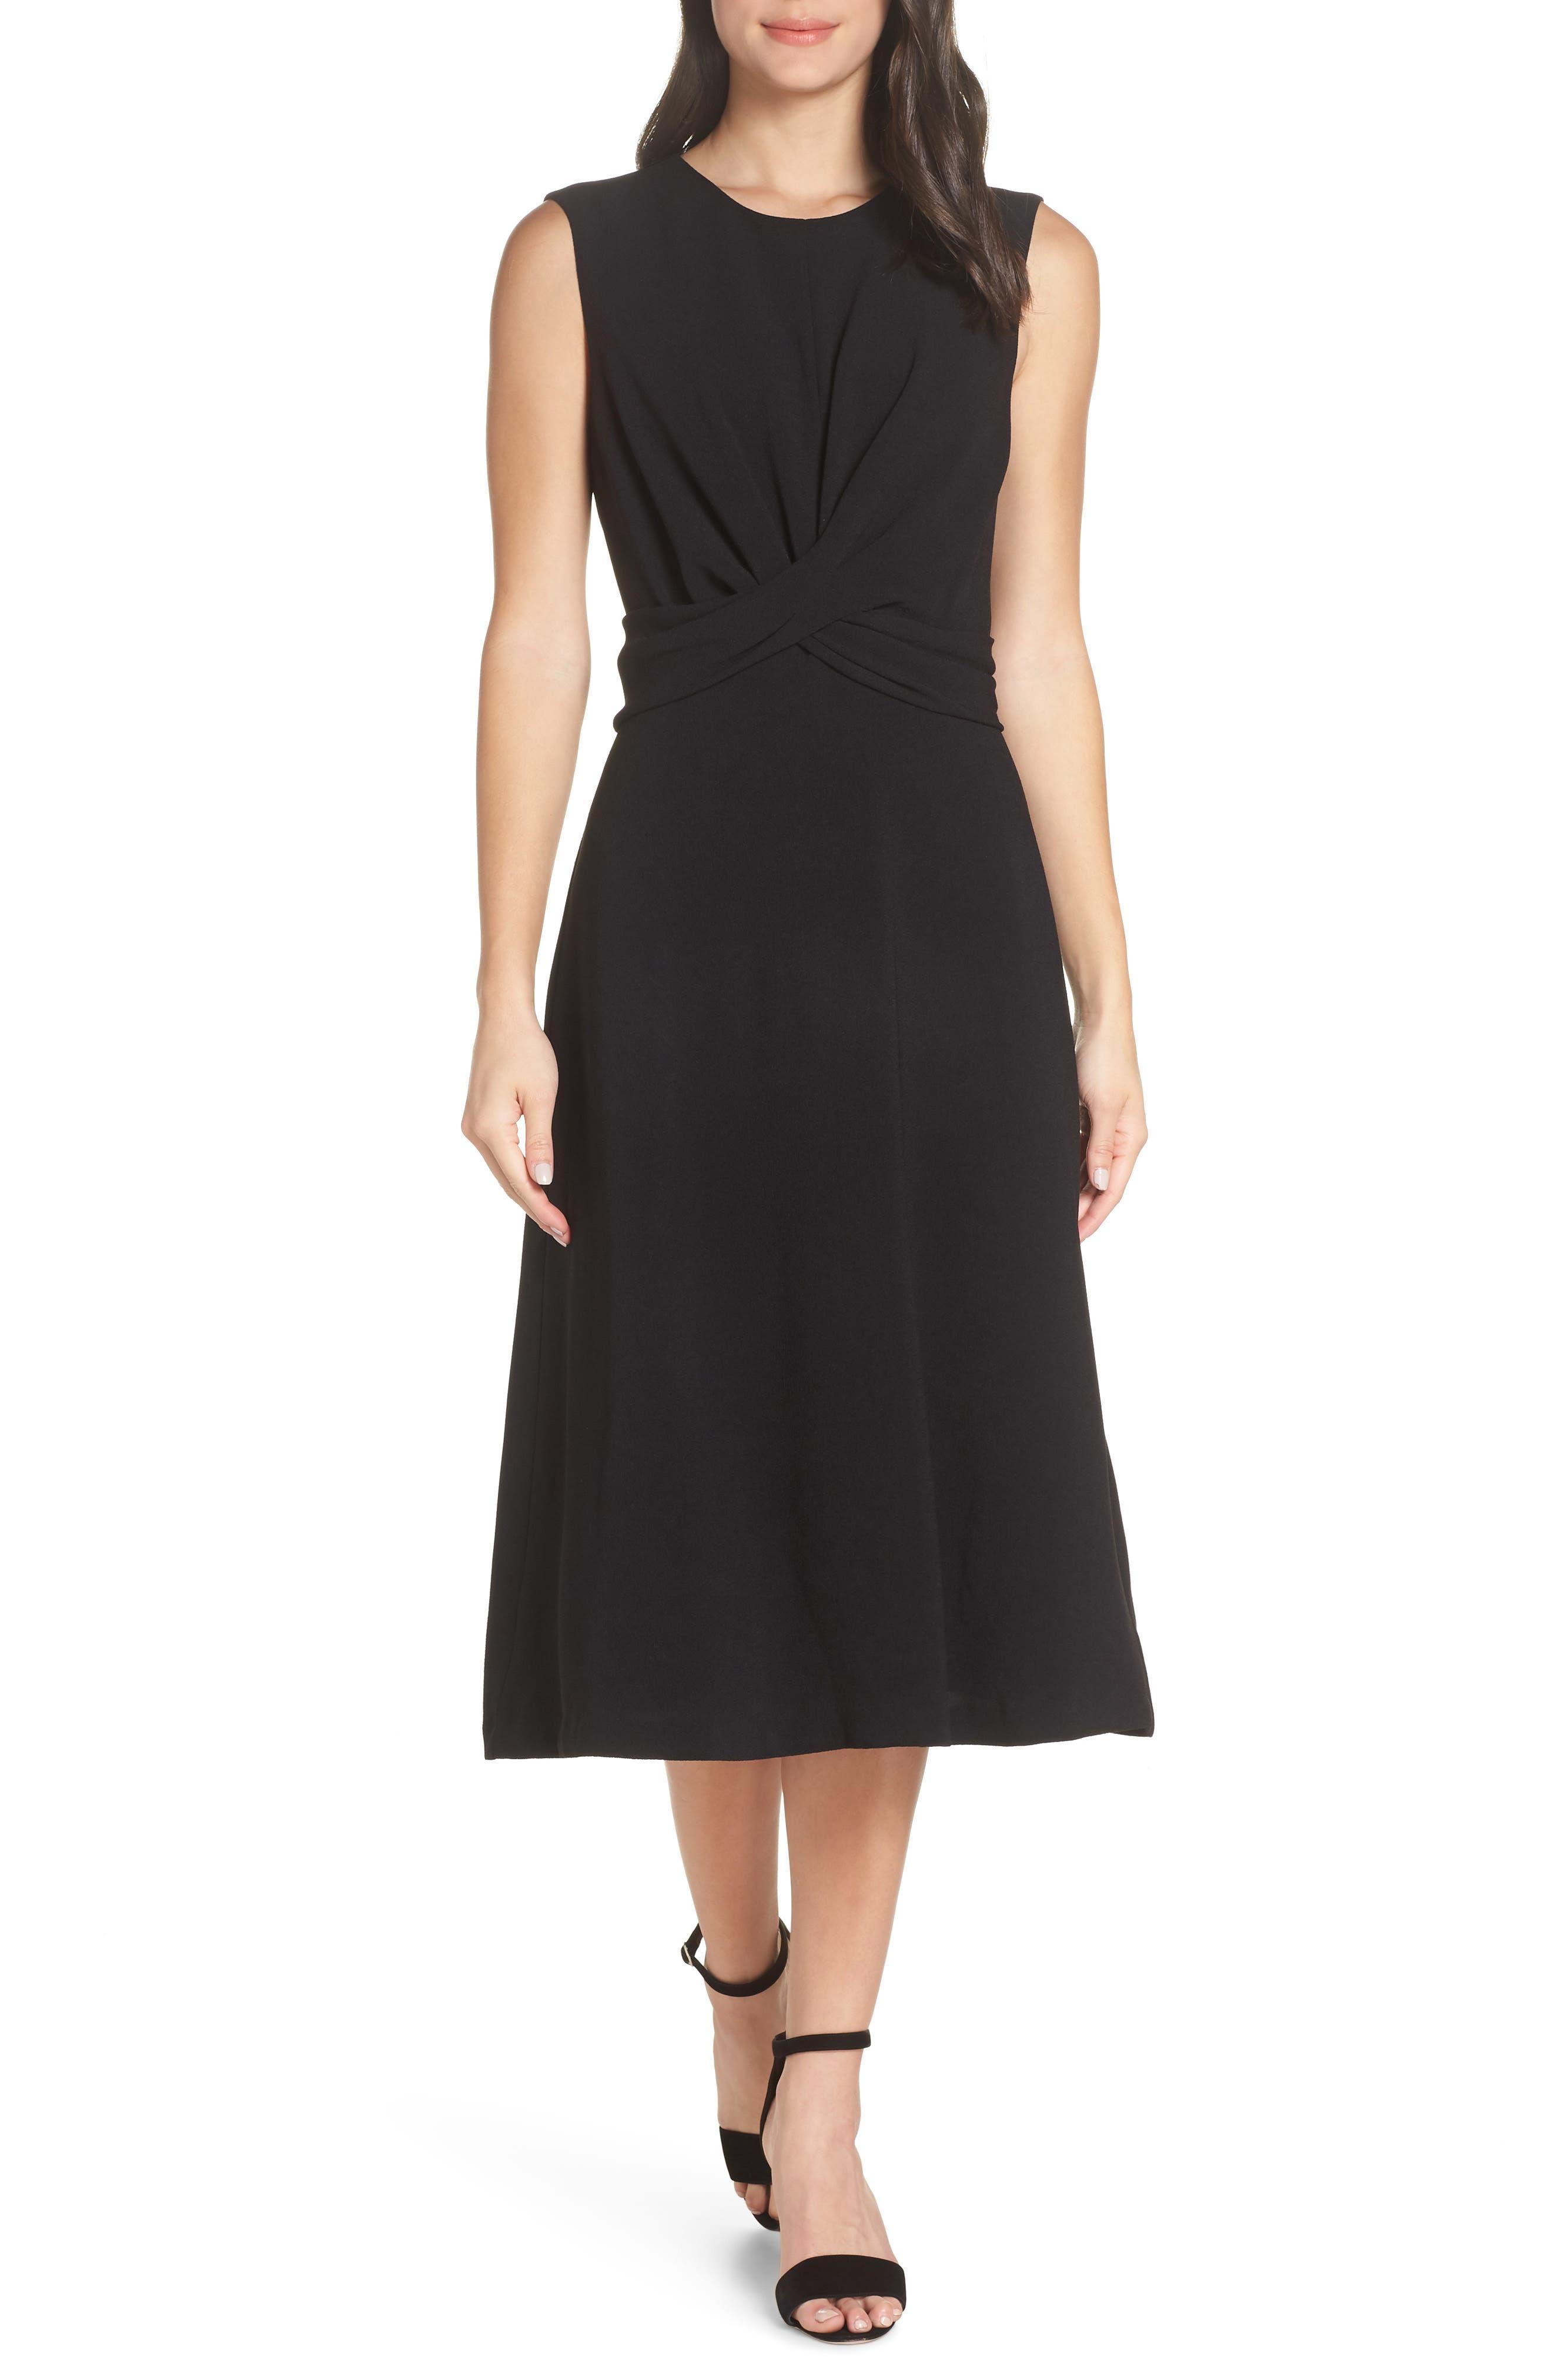 HARPER ROSE, Sleeveless Cross Front Midi Dress, Main thumbnail 1, color, 001